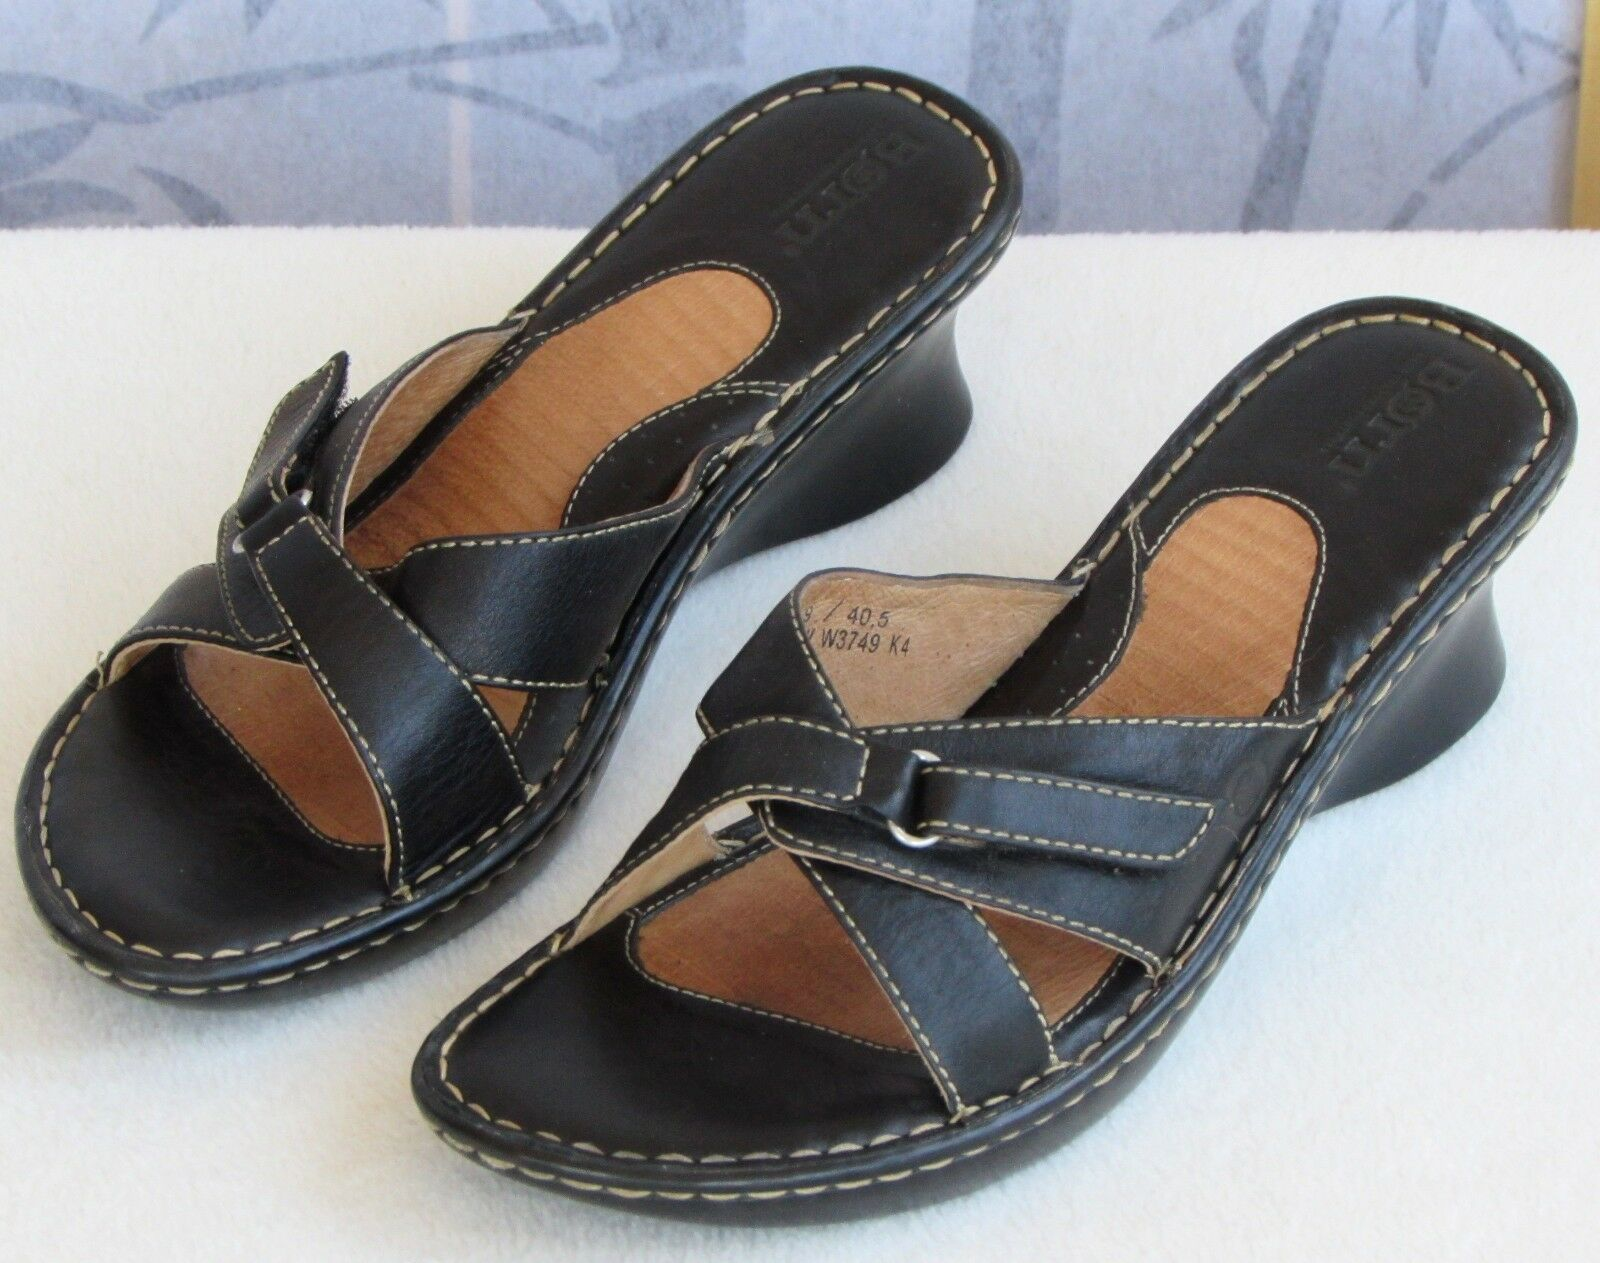 9 Leather | Born Women Black Leather 9 Cross Strap Open Toe Wedge Pump Slip On Sandal Shoe 6bf603